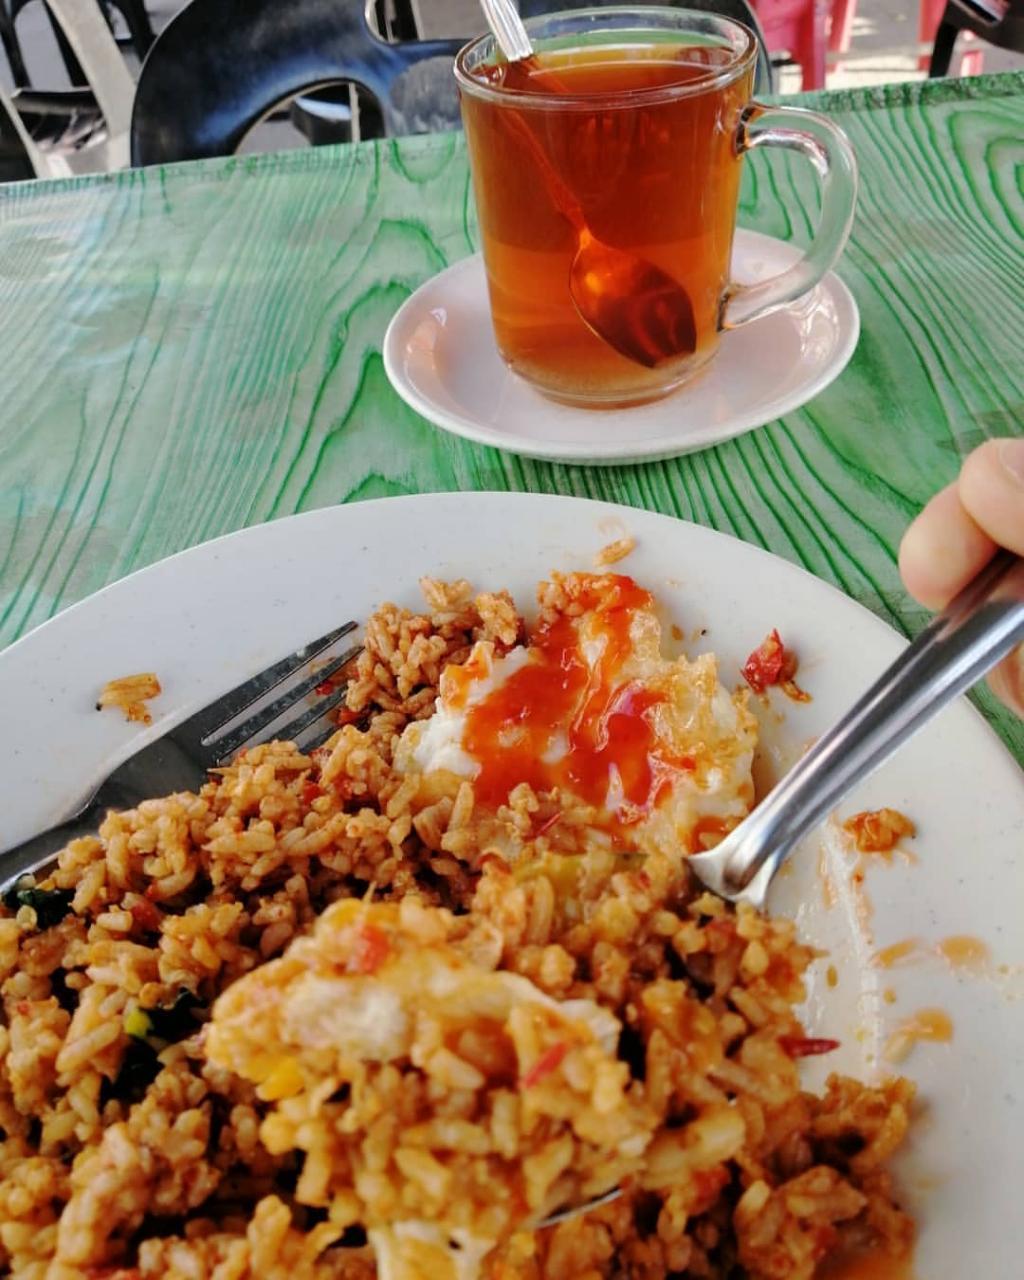 Ayah Lapar, Cuma Minta Nasi Goreng & Teh O Panas Je.. Tapi Ini Respon Kakak - Kisah Dunia